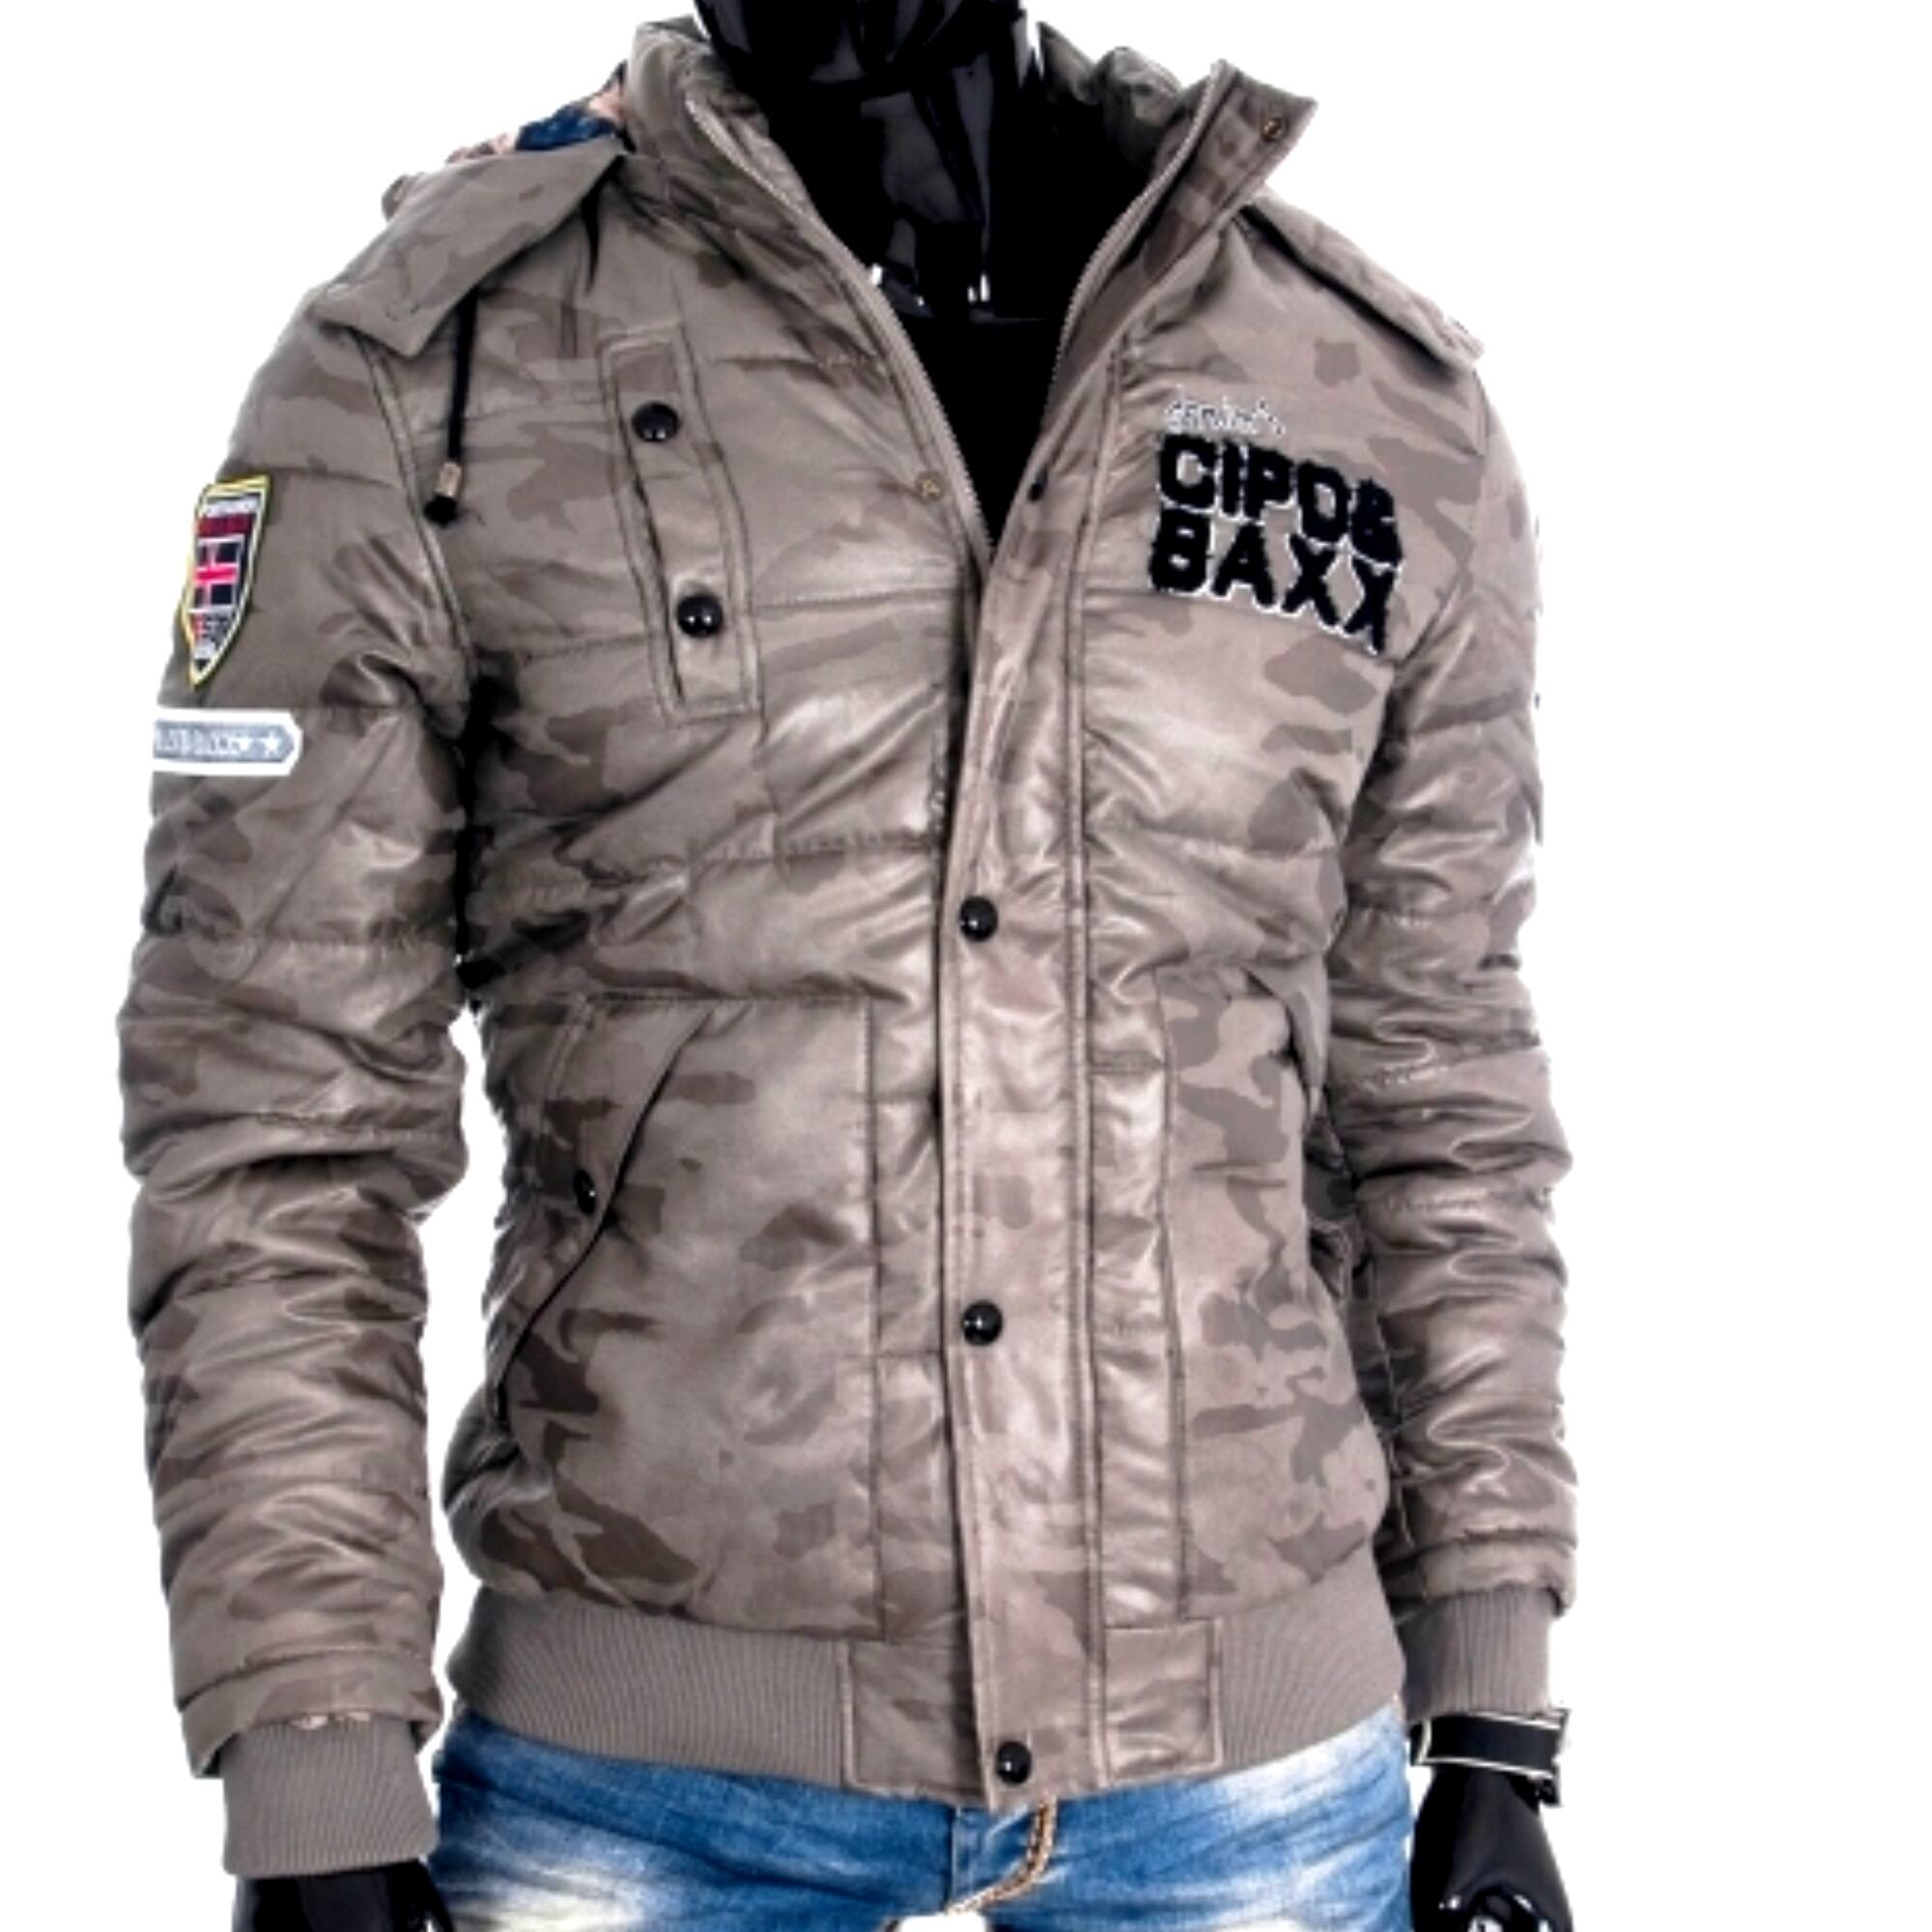 CIPO AND BAXX - MILITARY GR - Férfi Téli kabát - Prémium kategória ... 328bf89a9f